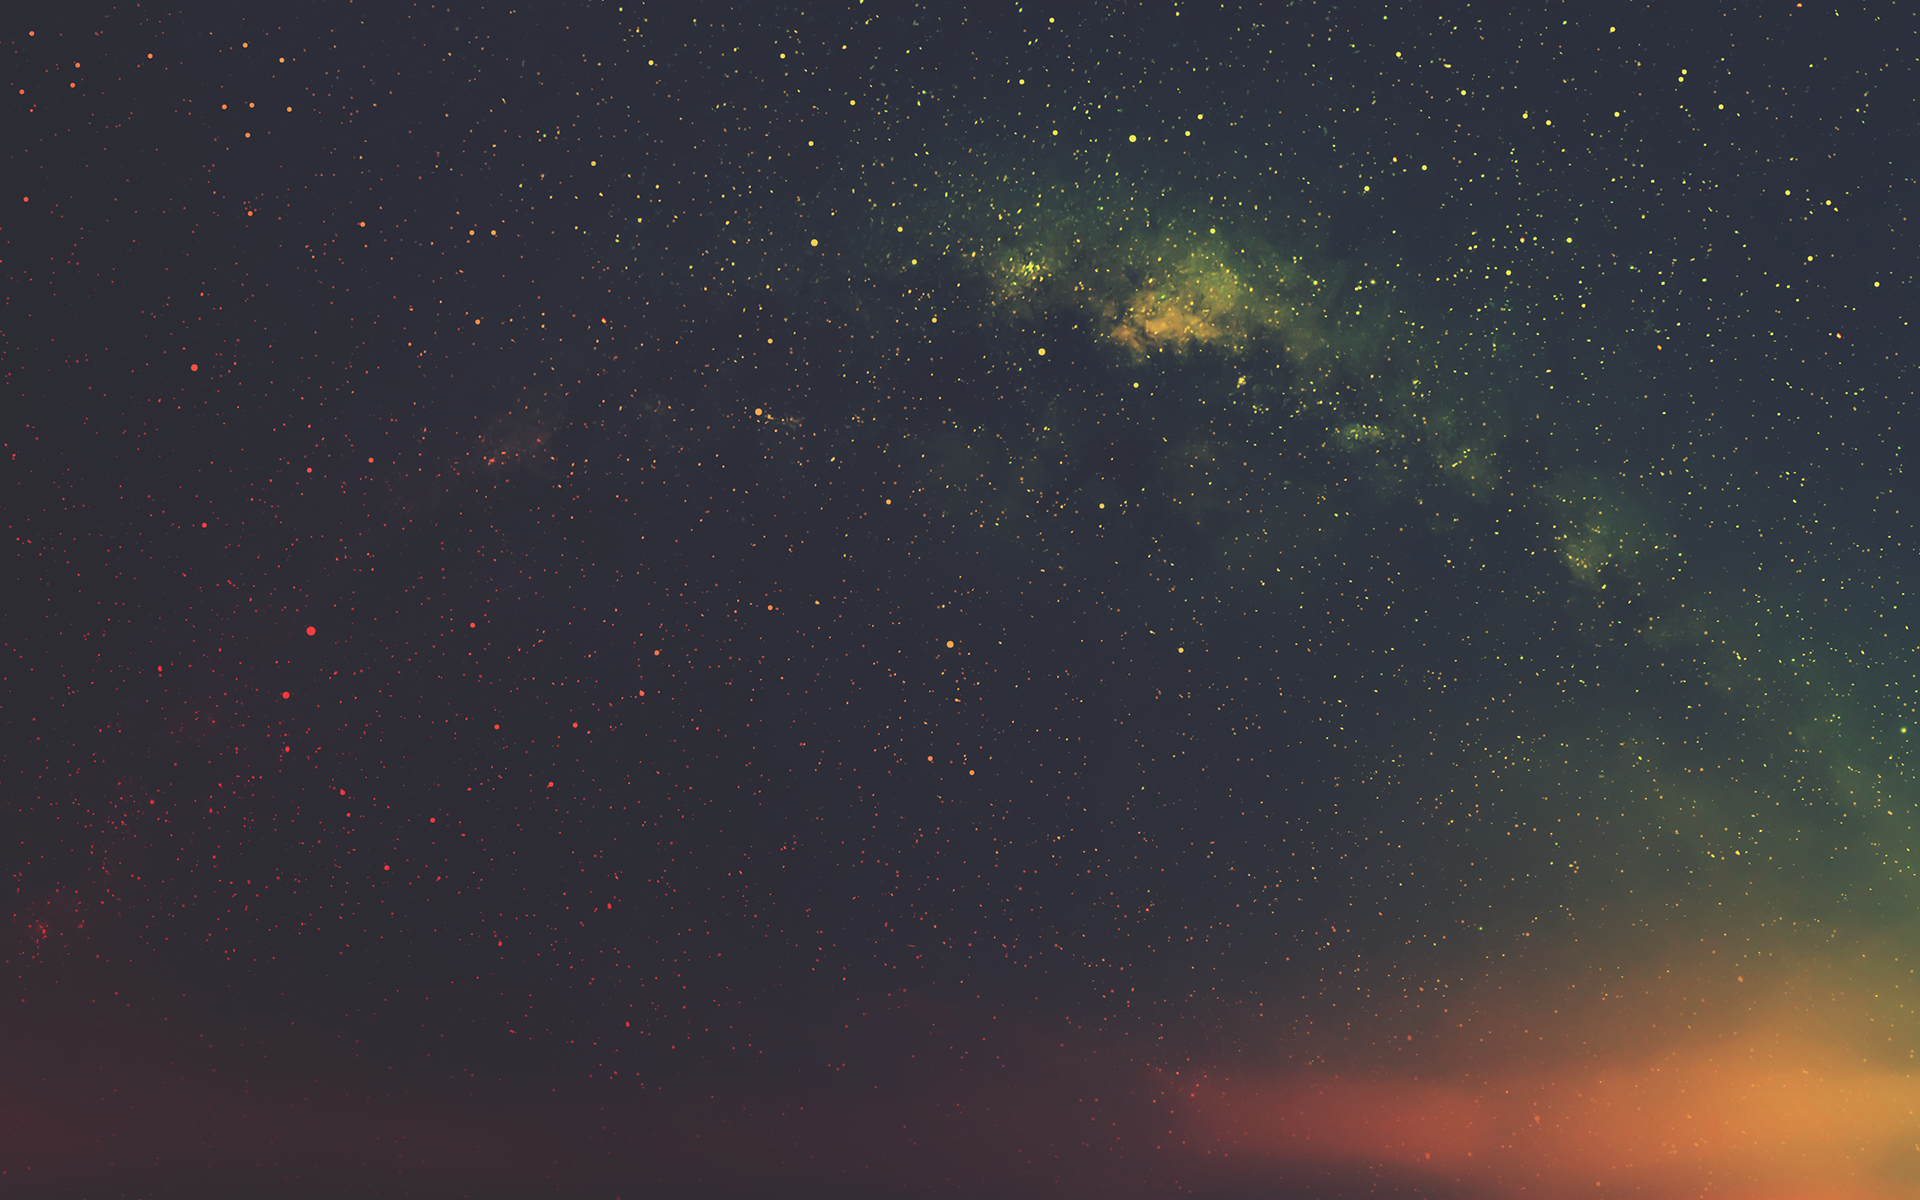 Top Wallpaper Night Galaxy - pexels-photo-14676  Perfect Image Reference-213615.jpg\u0026fm\u003djpg